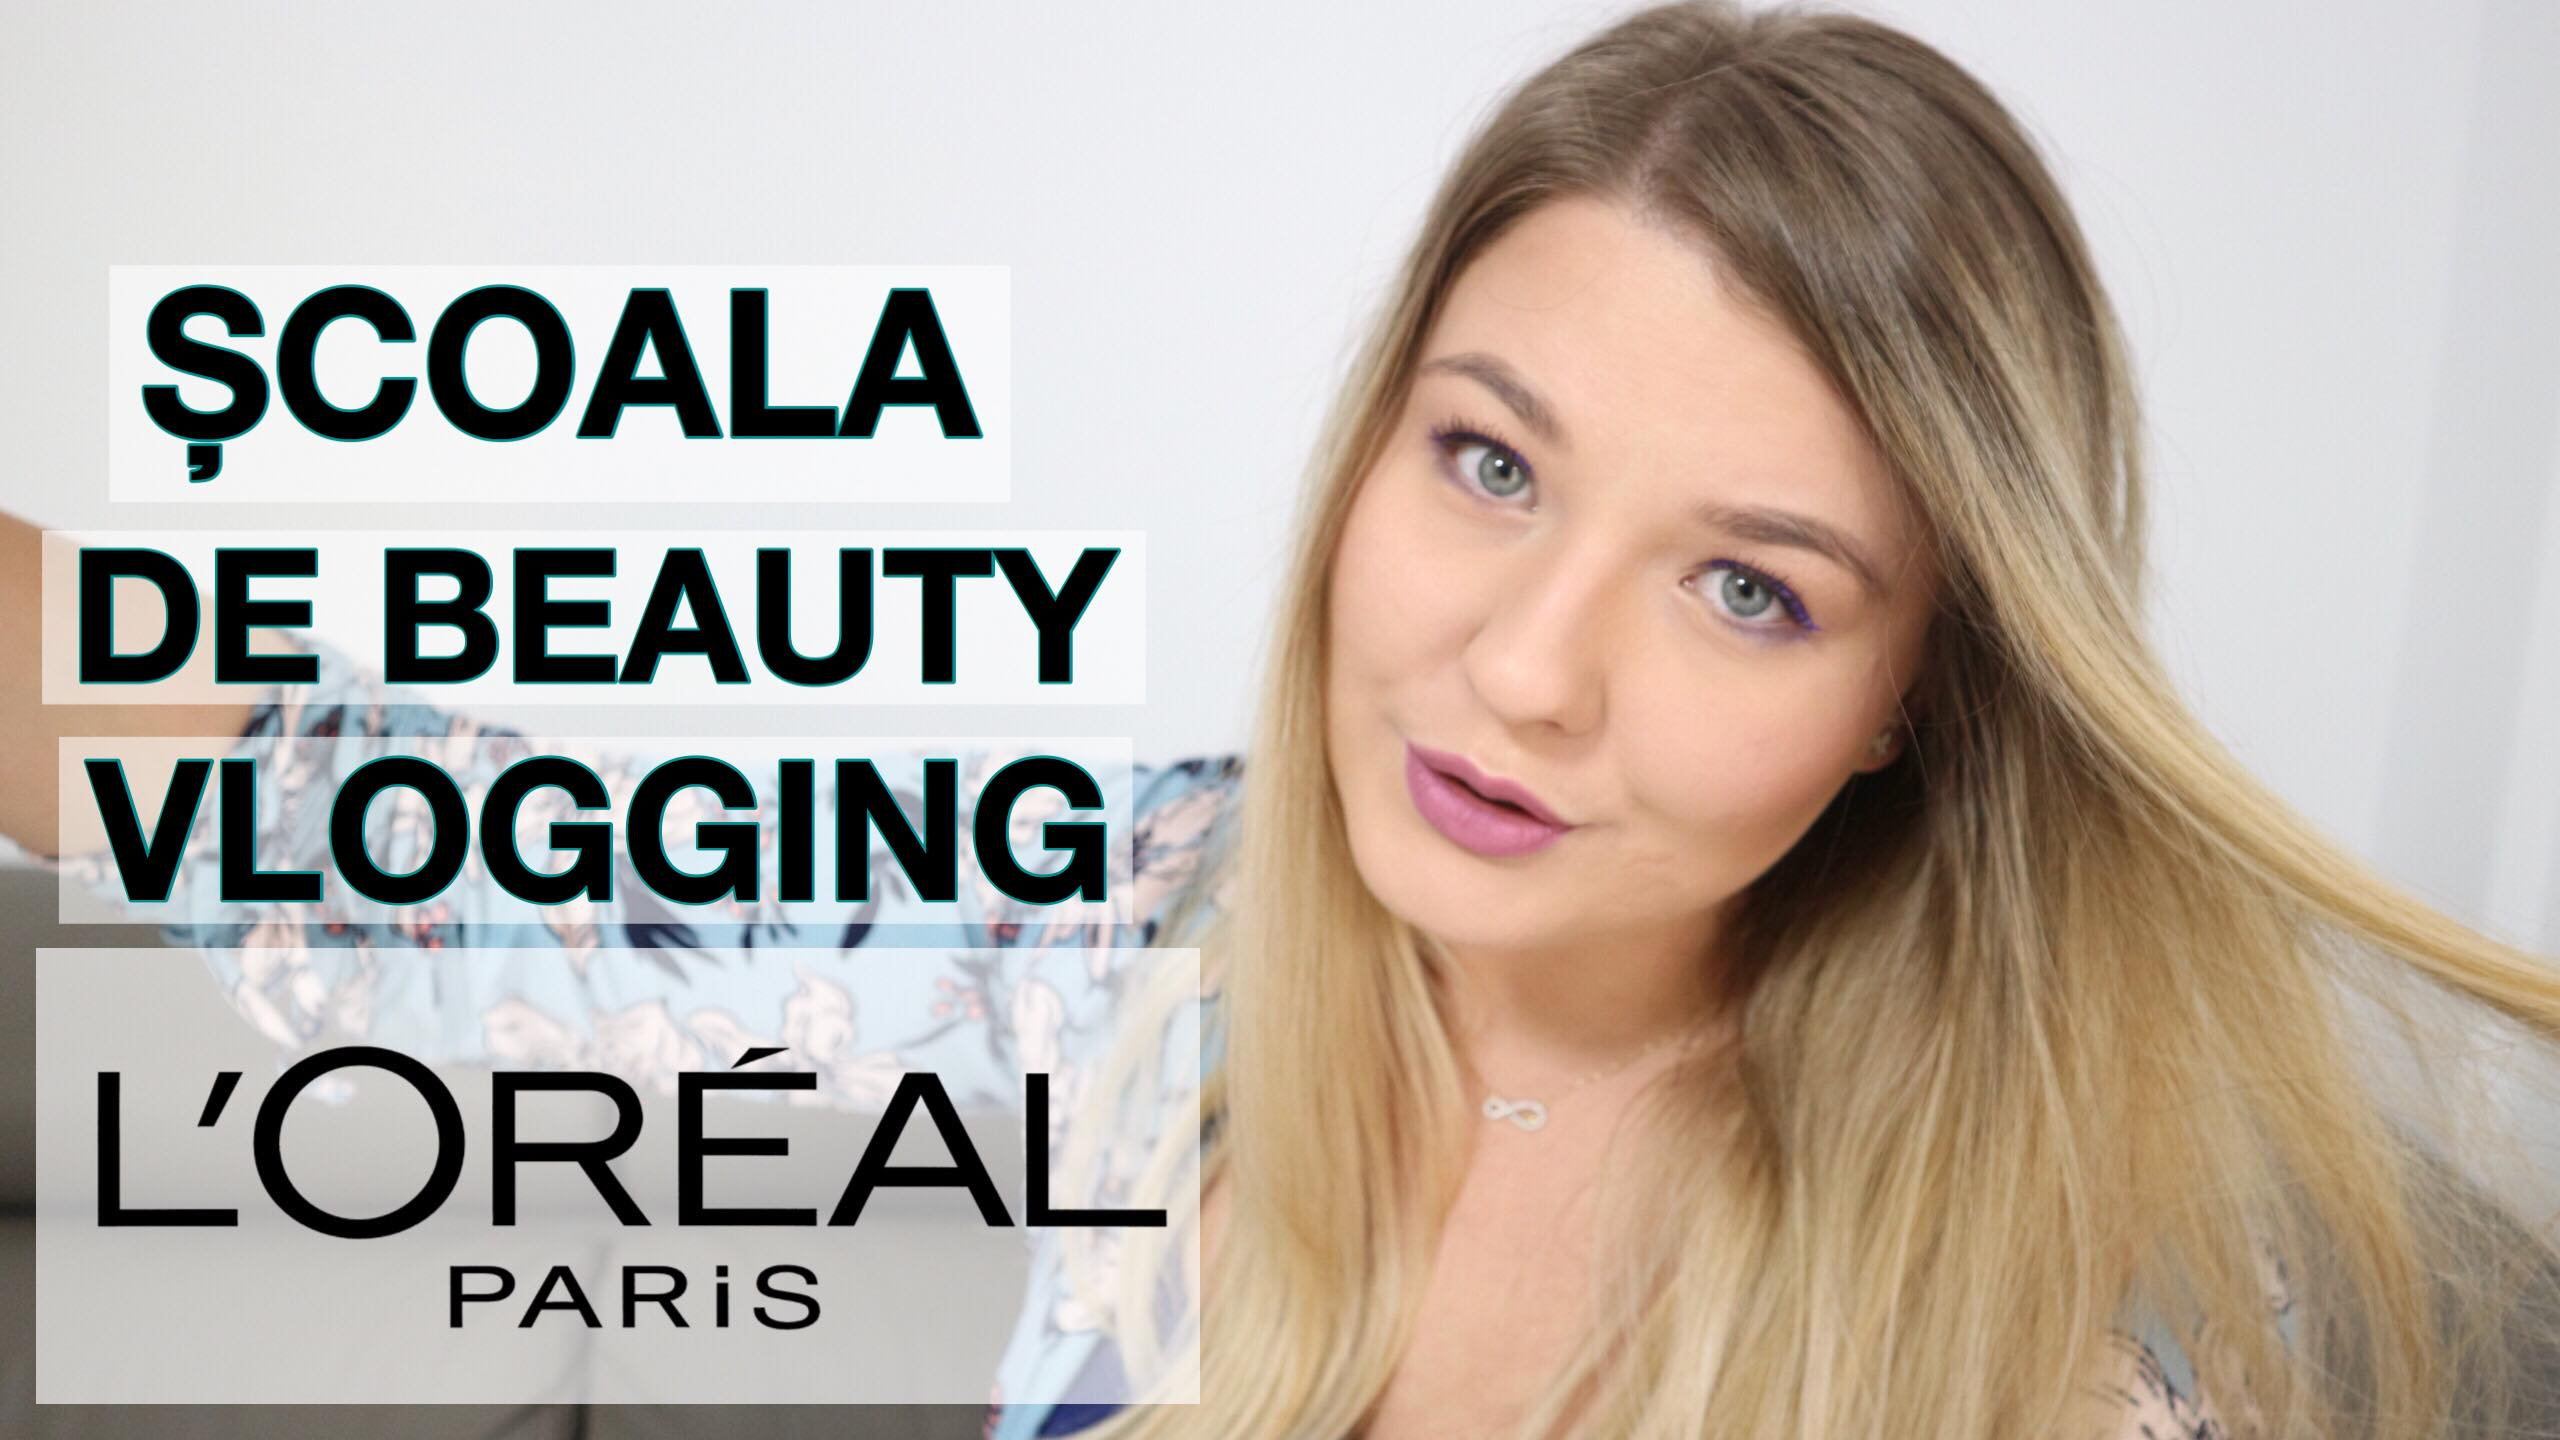 scoala_de_beauty_vlogging